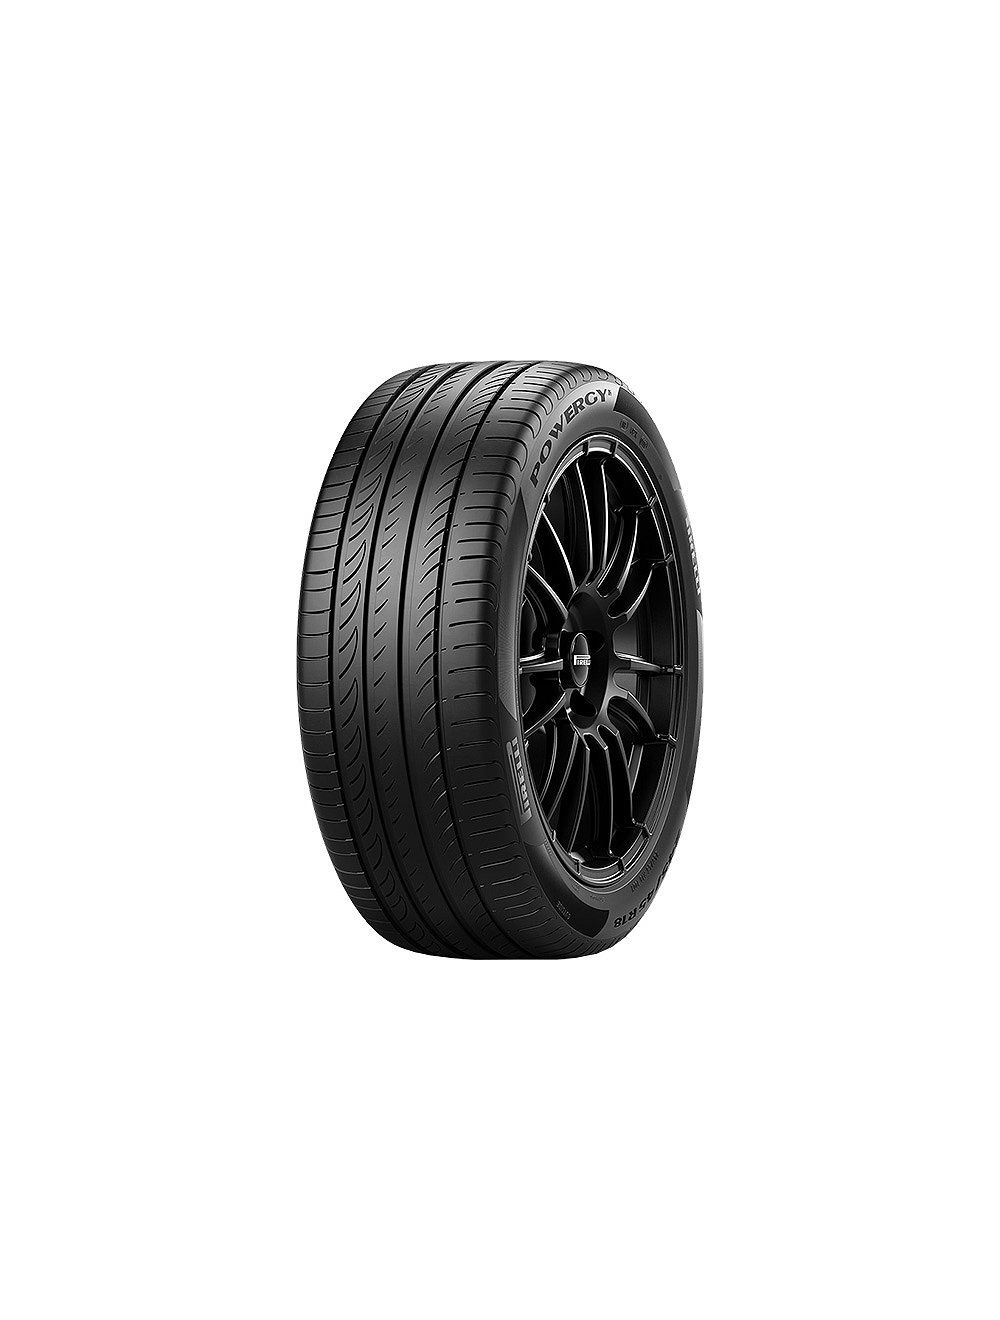 Pirelli 245/40R18 Y Powergy XL Nyári gumi